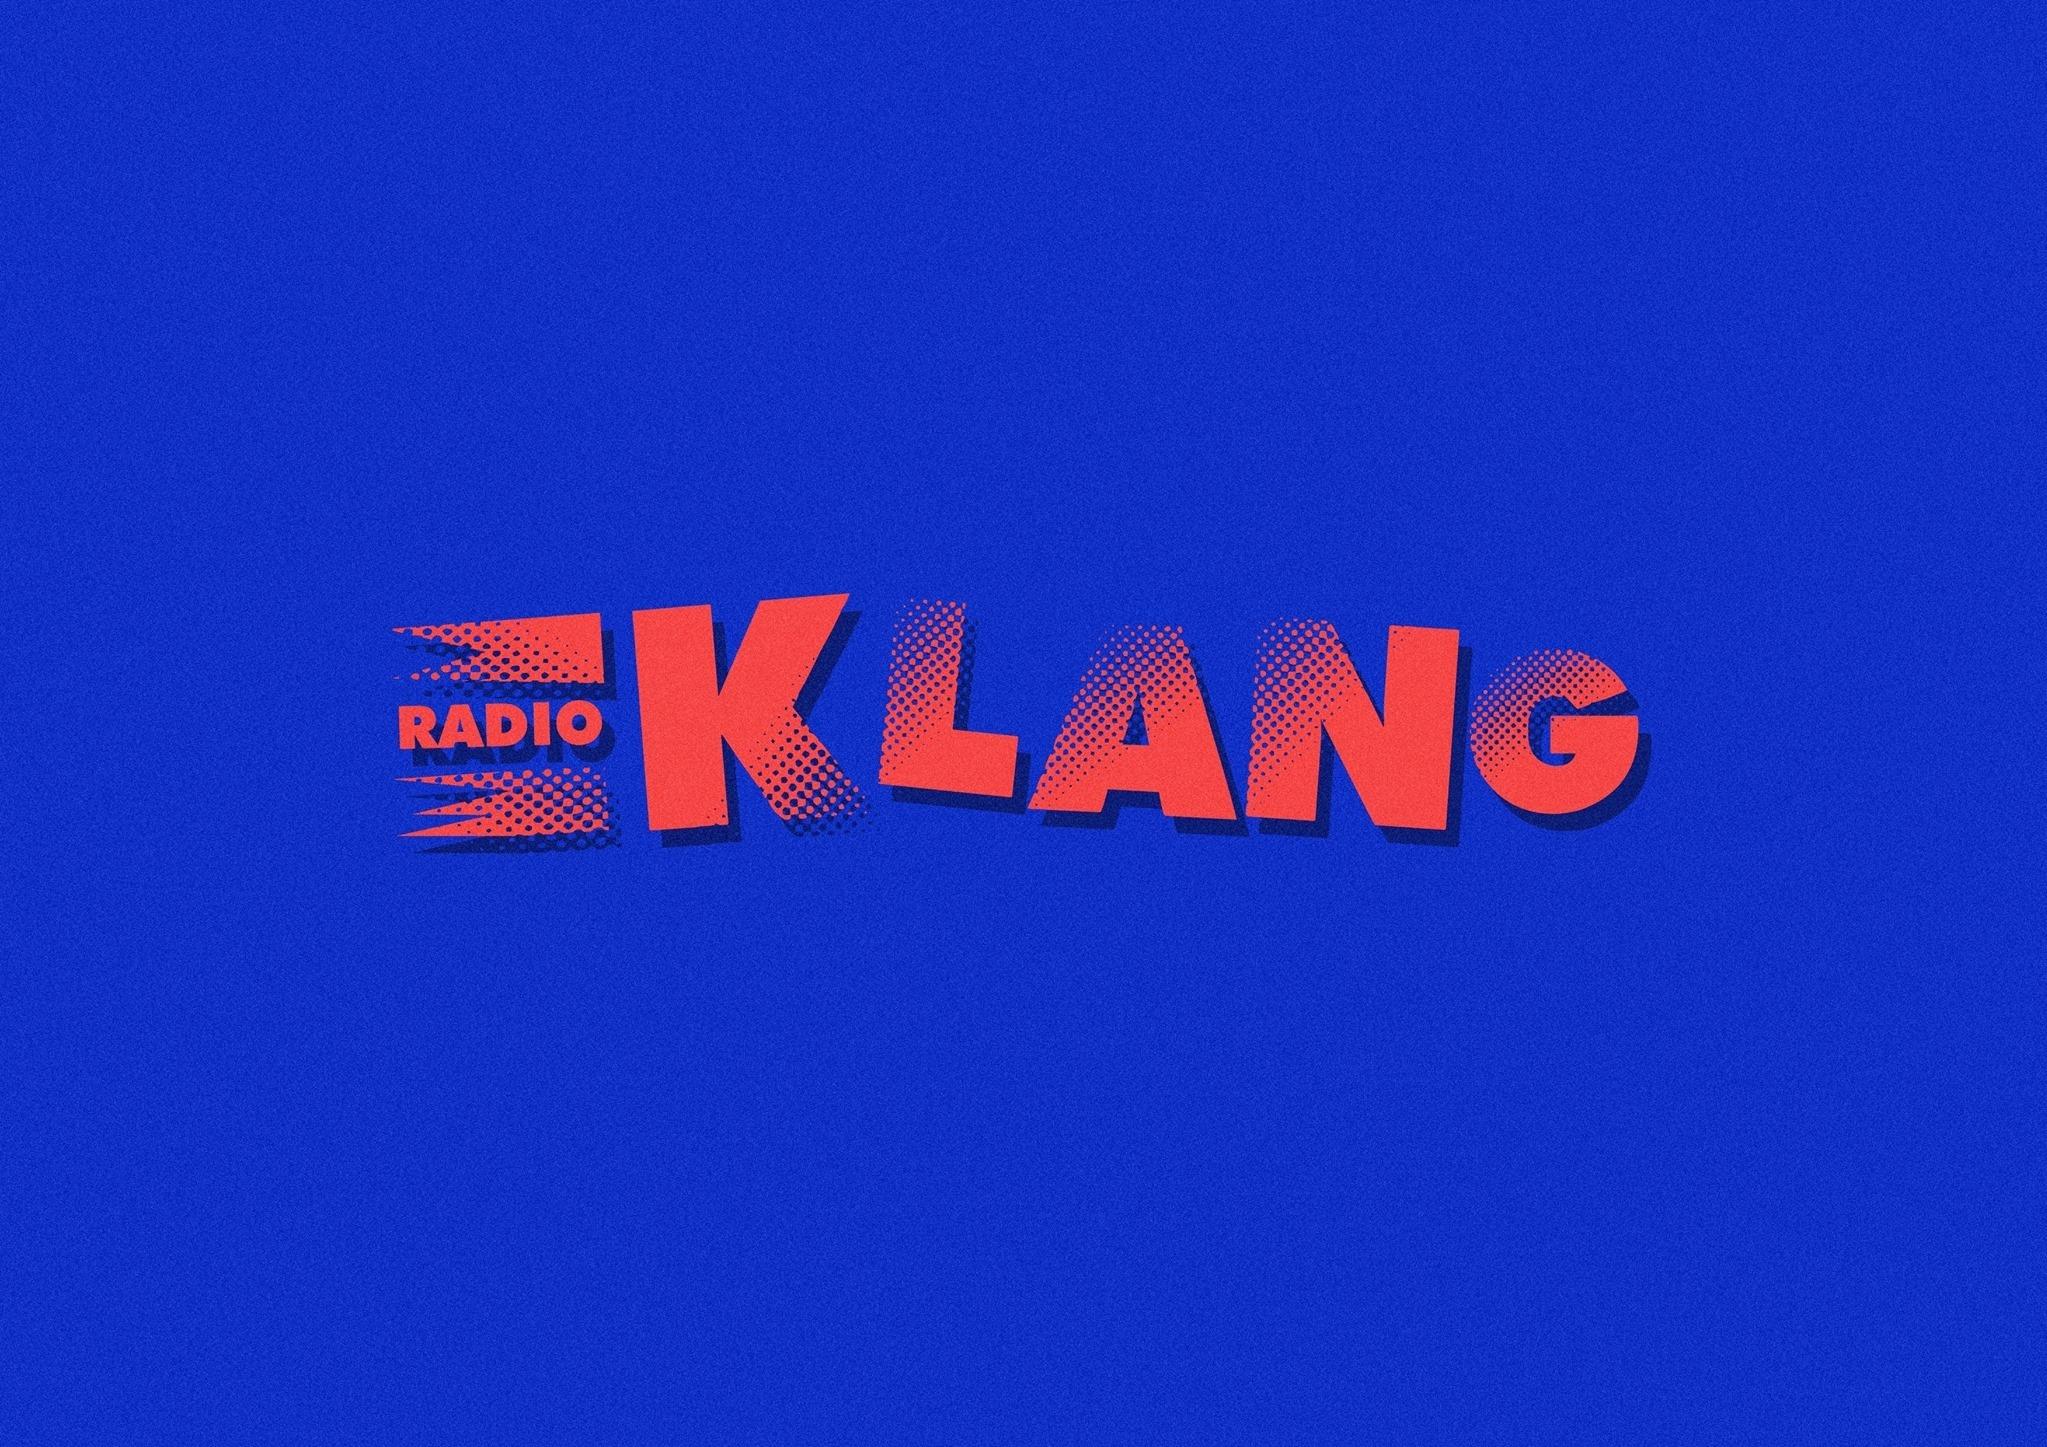 RADIO KLANG